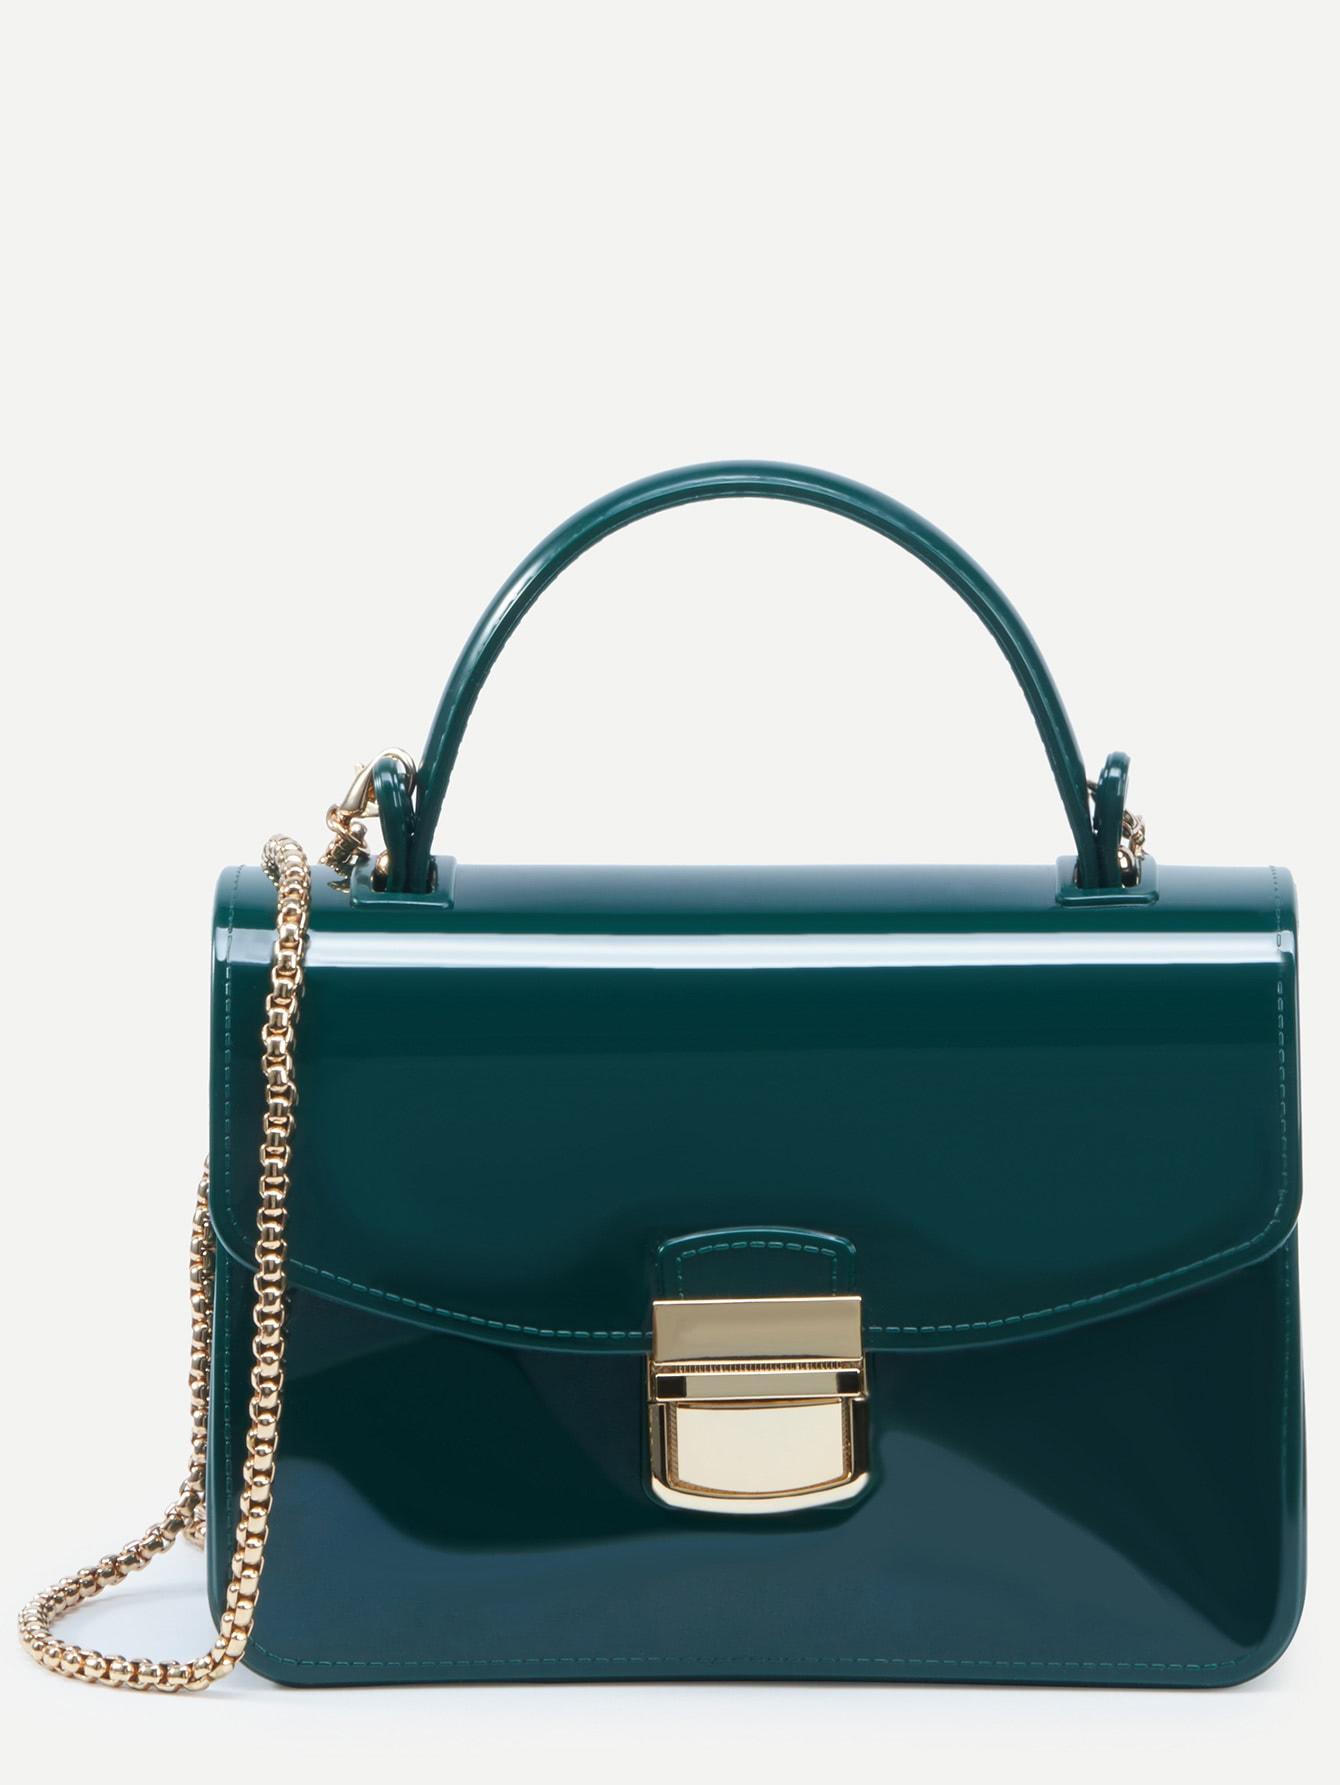 Green Pushlock Closure Plastic Handbag With Chain